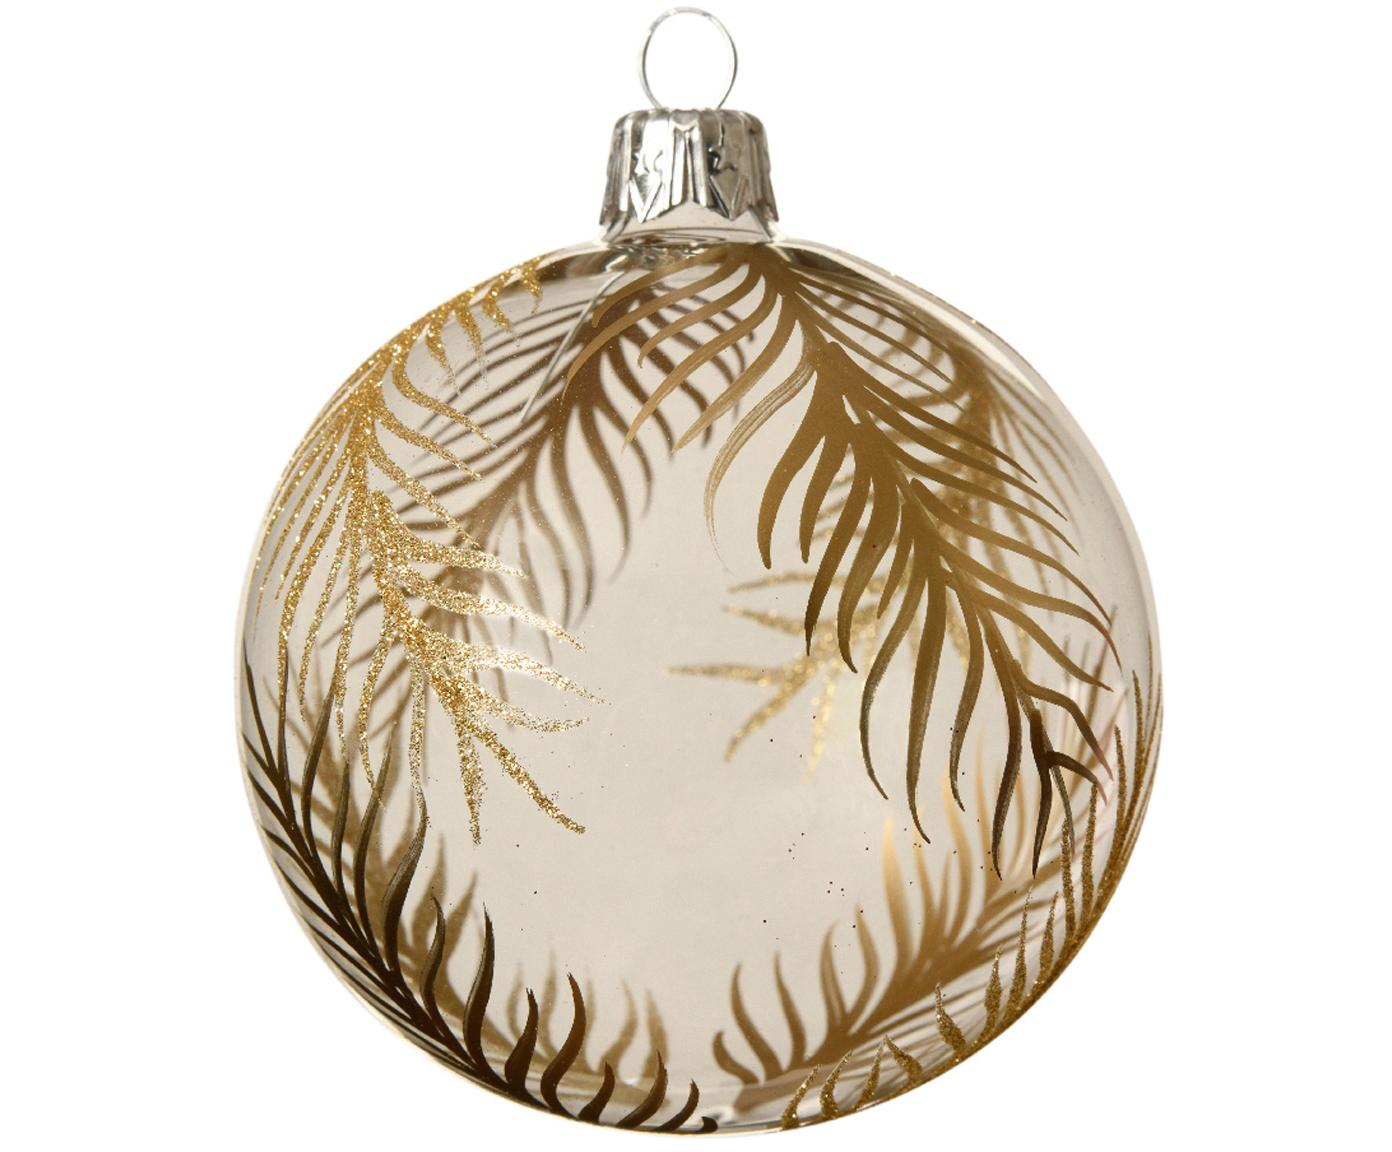 Weihnachtskugeln Gold Leaves Ø8cm, 2Stück, Transparent, Goldfarben, Ø 8 cm